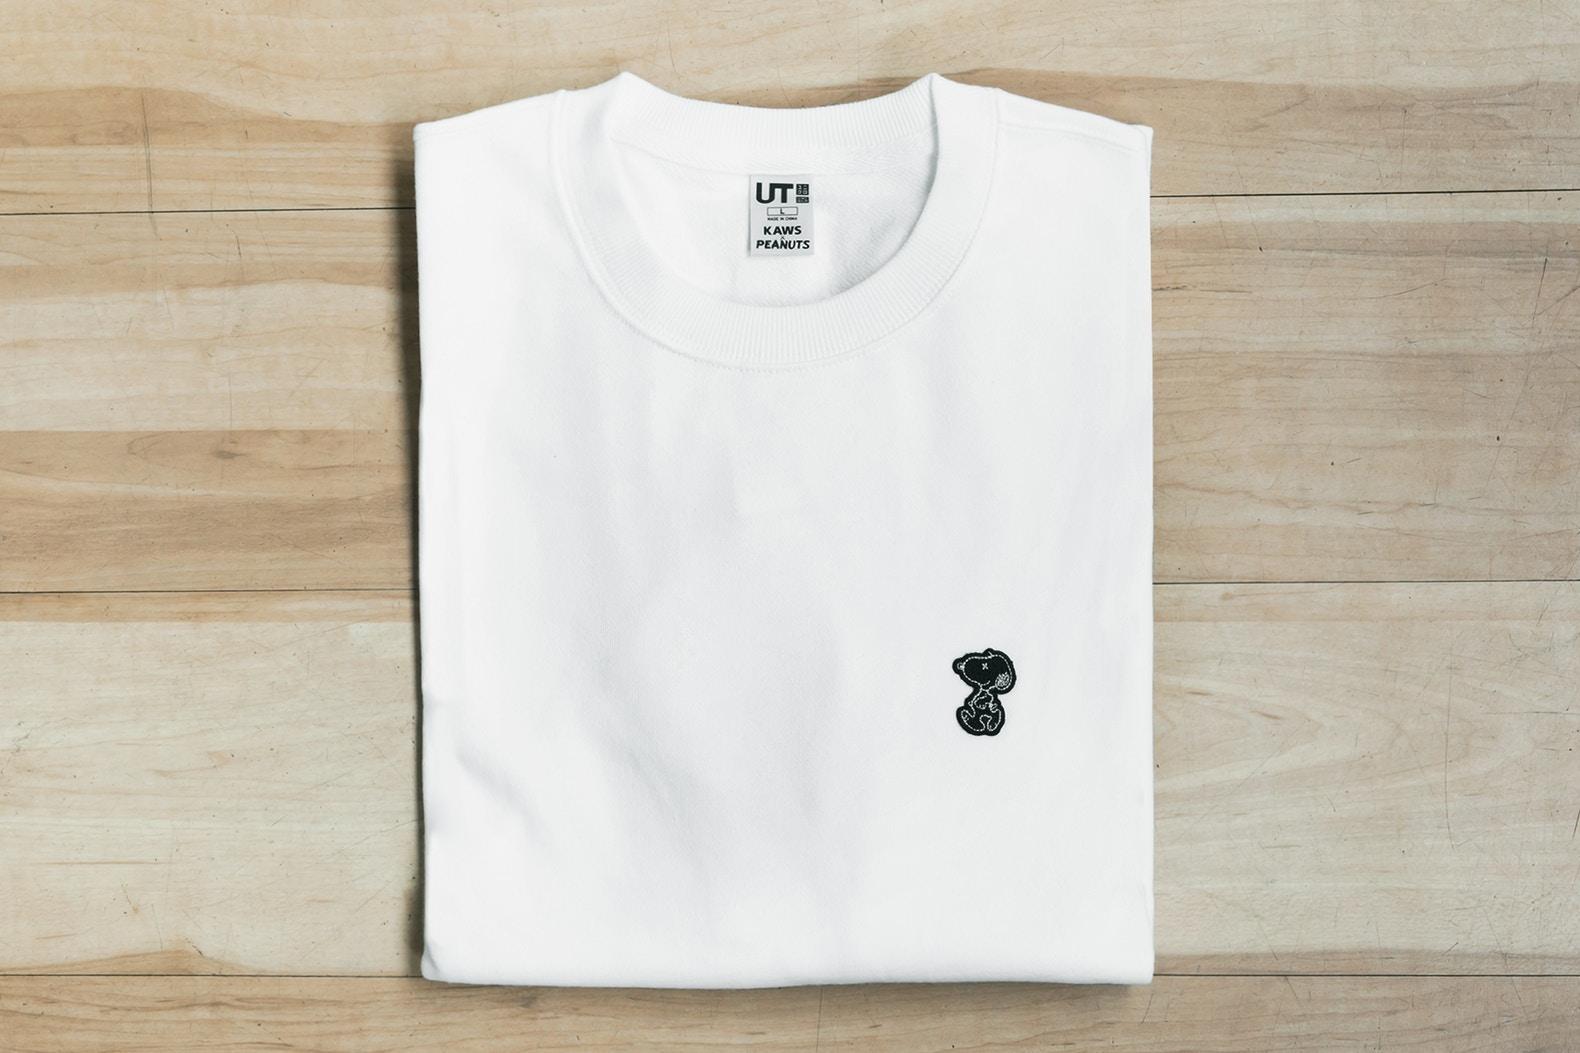 http_bae-hypebeast-comfiles201711kaws-peanuts-uniqlo-ut-collection-4